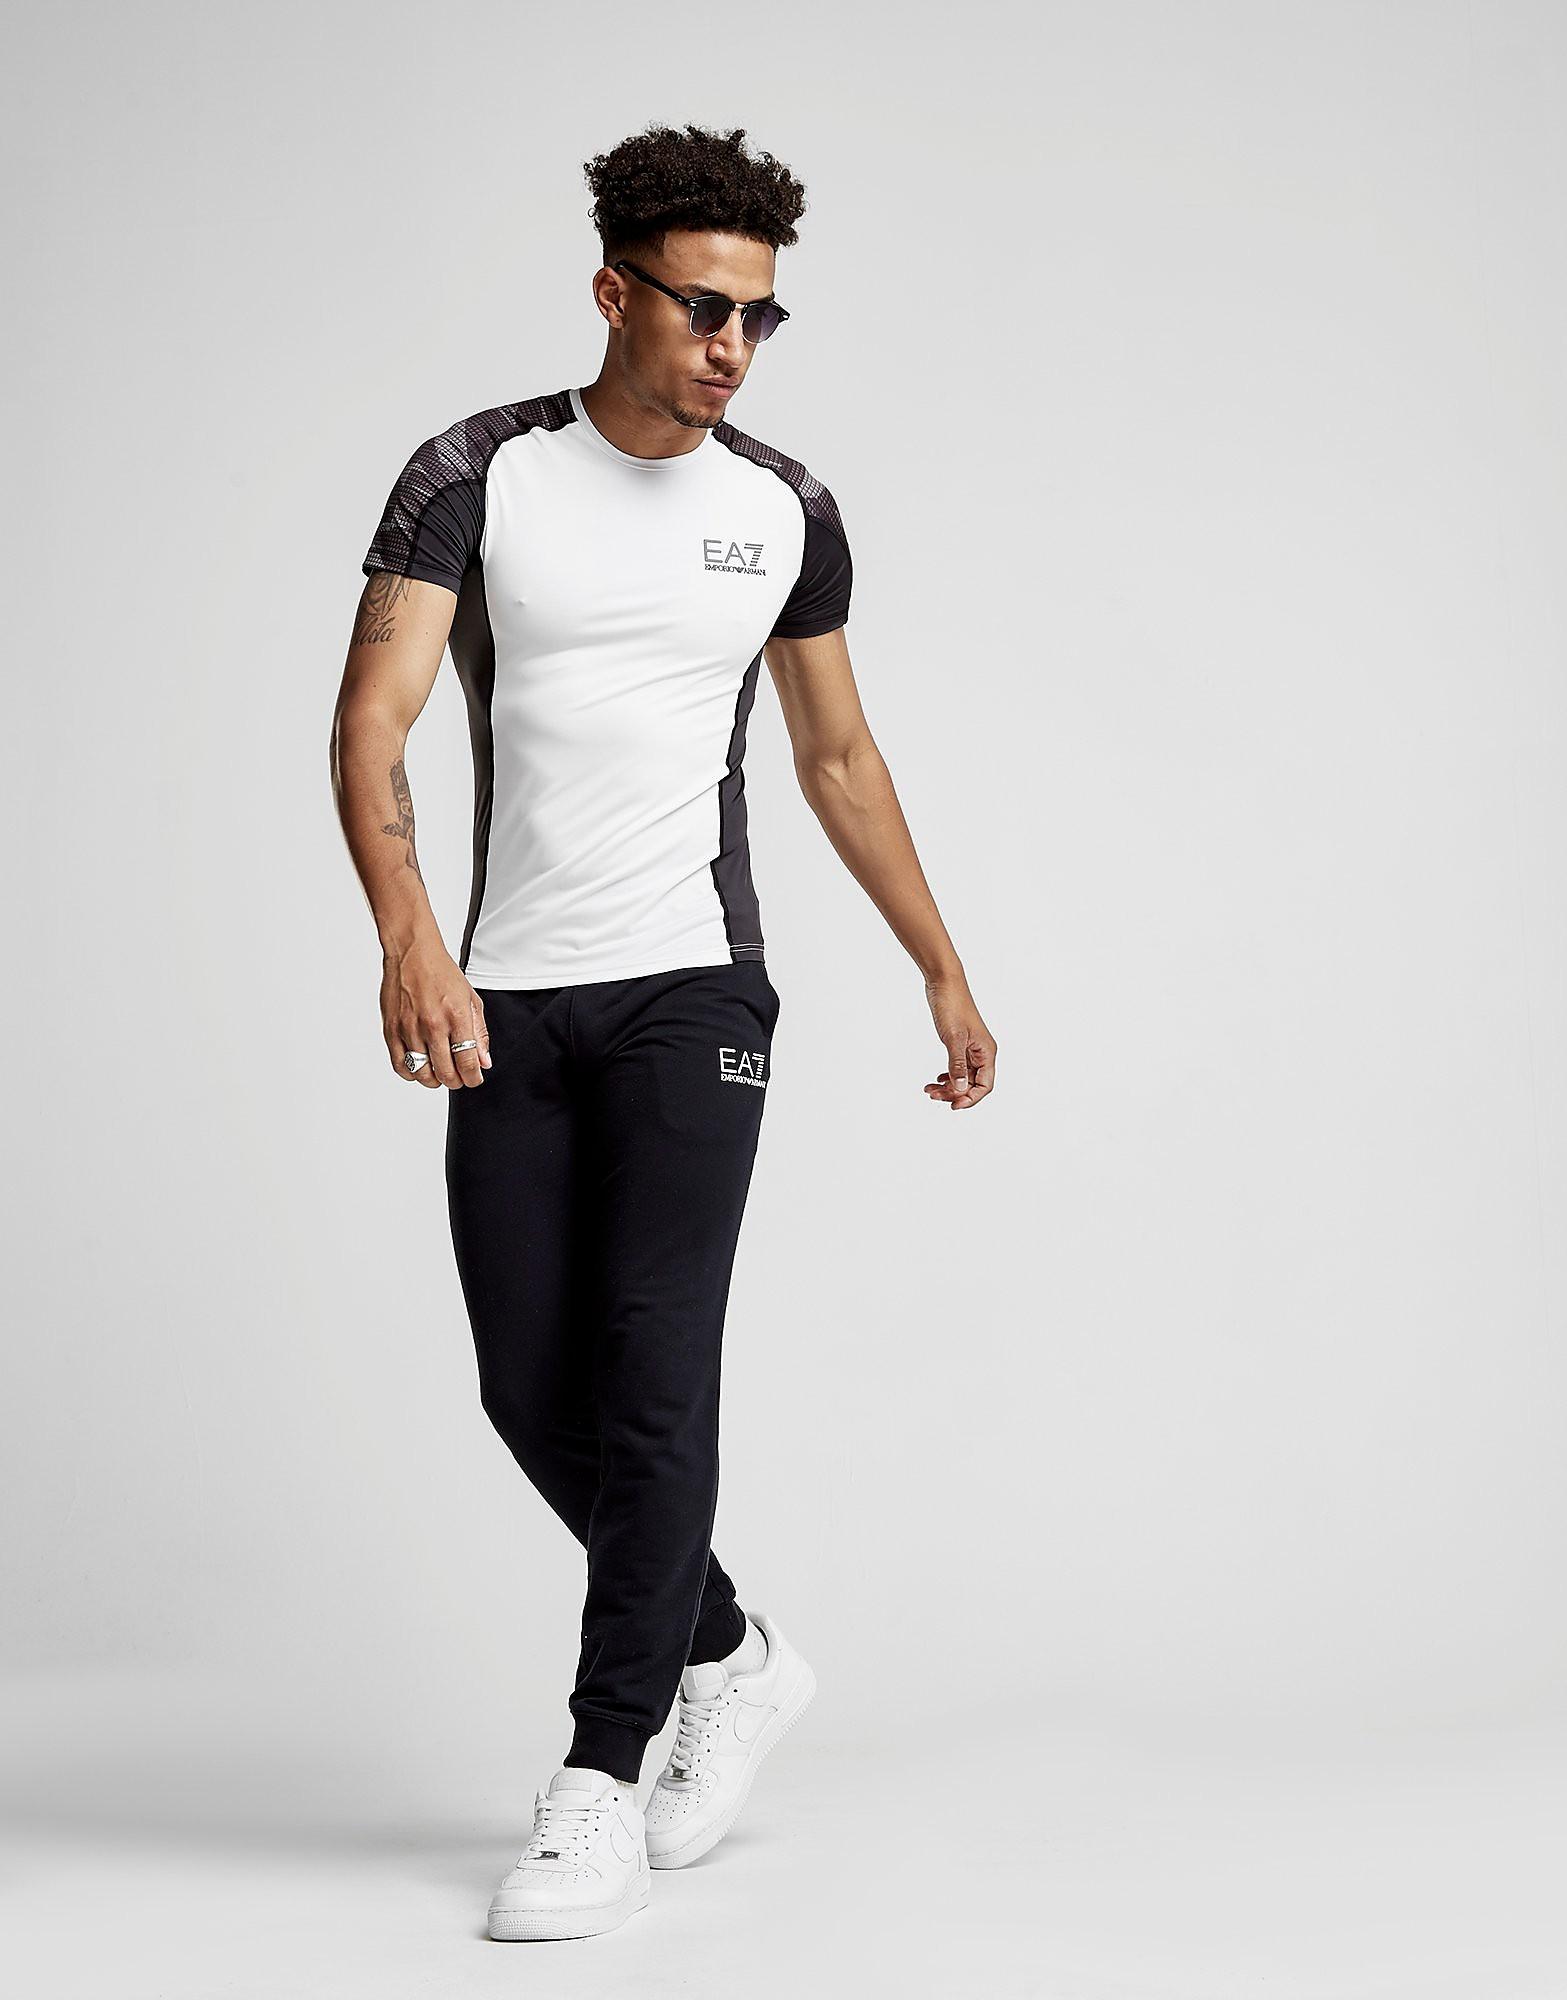 Emporio Armani EA7 camiseta Poly Tech